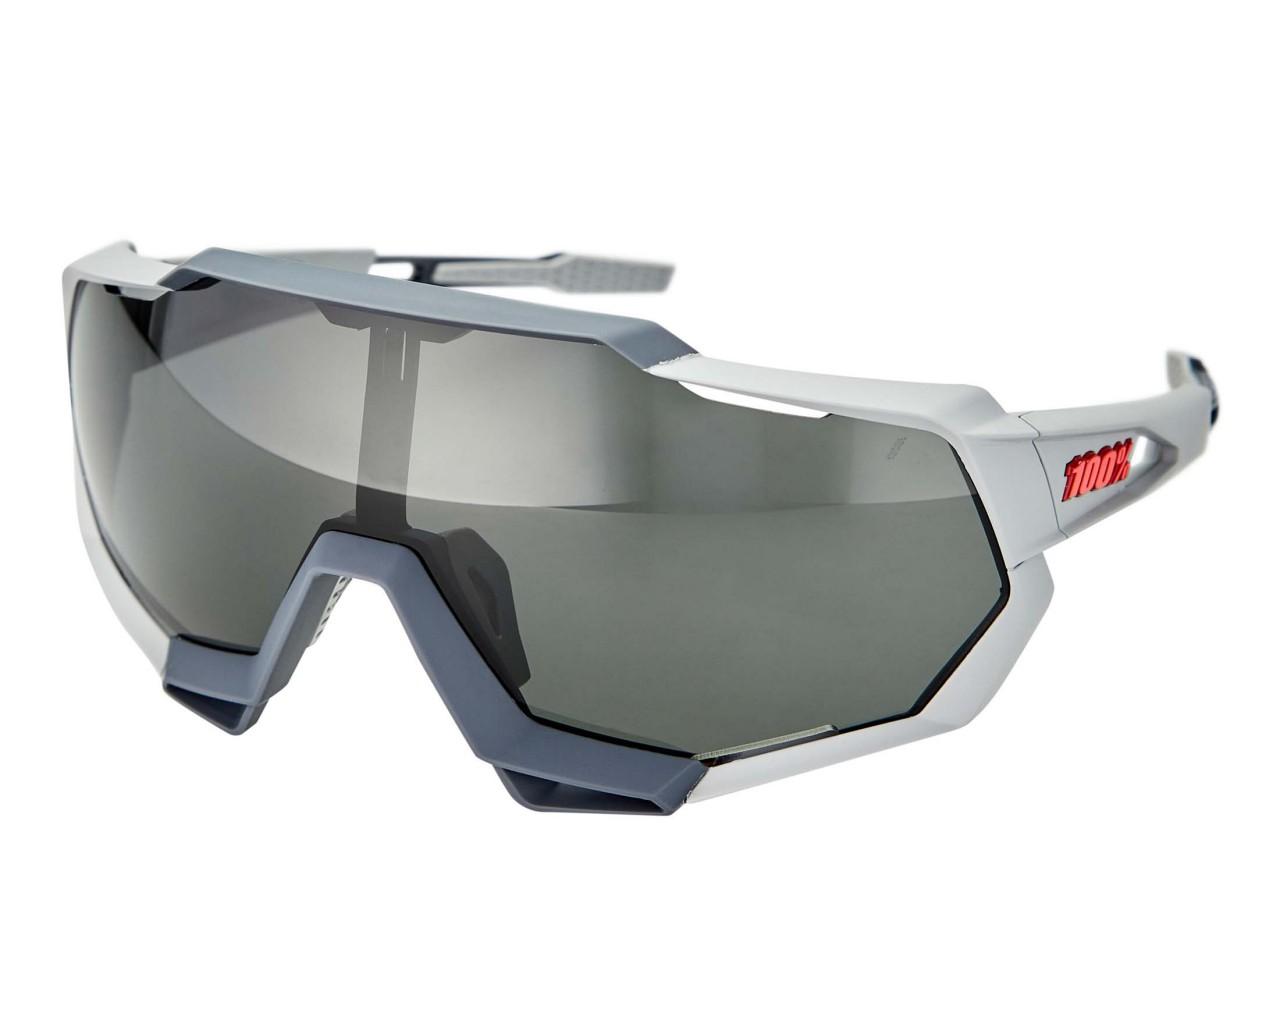 100% Speedtrap - Smoke Lense Sportbrille   soft tact stone grey